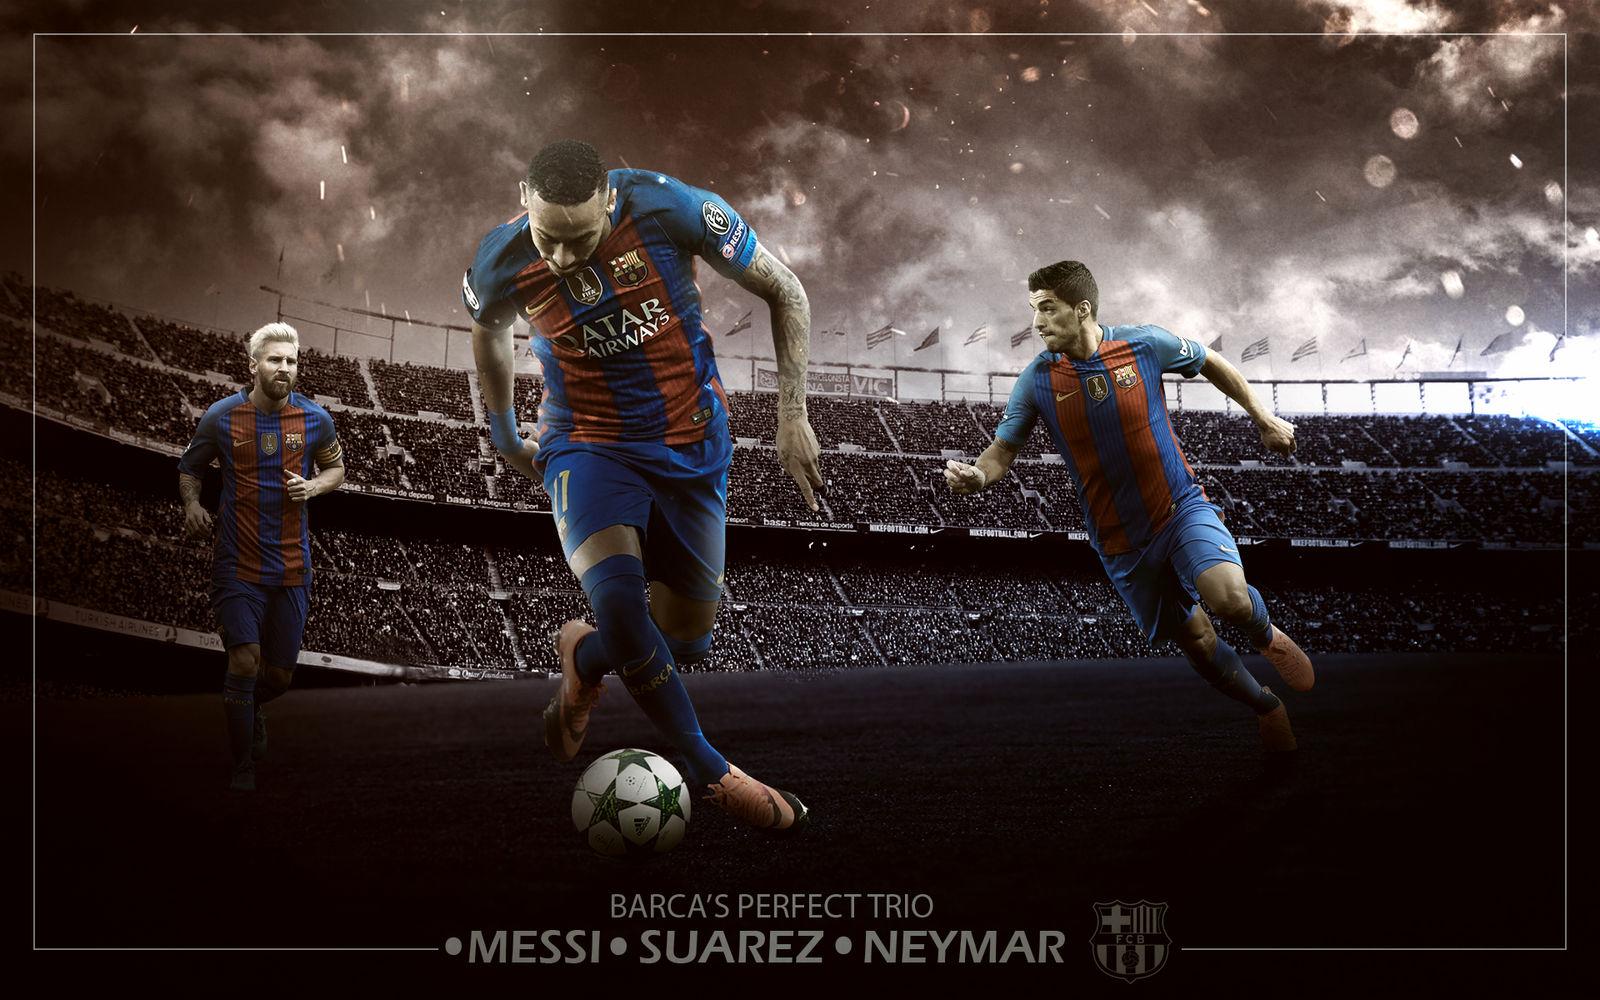 Messi Suarez Neymar Wallpaper Msn By Chrisramos4gfx On Deviantart